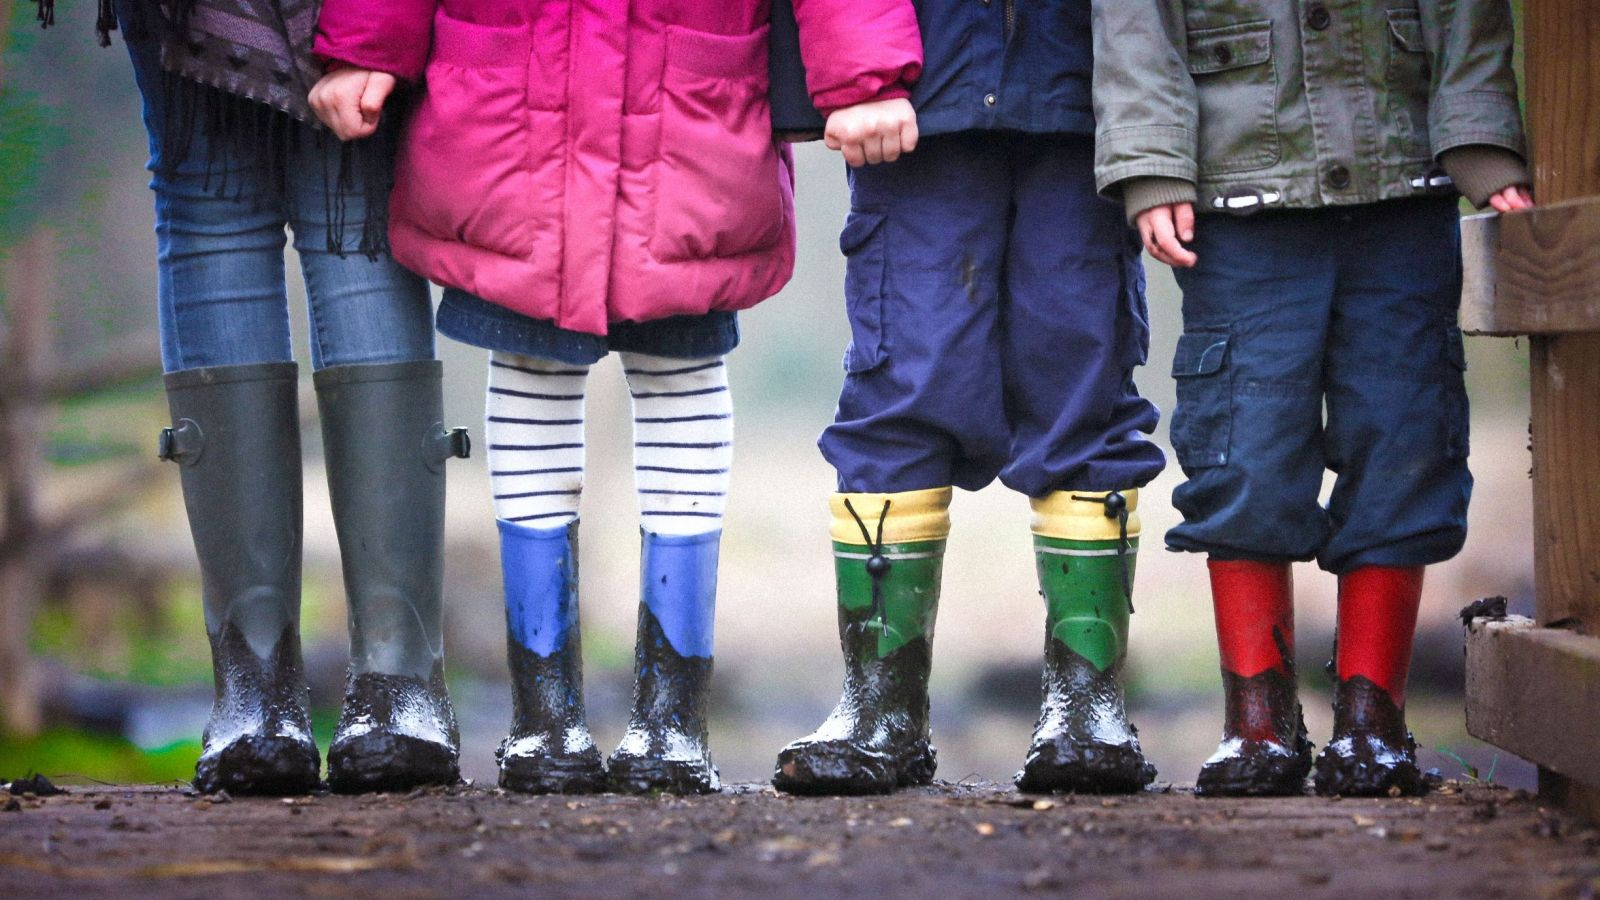 Child Observation Report